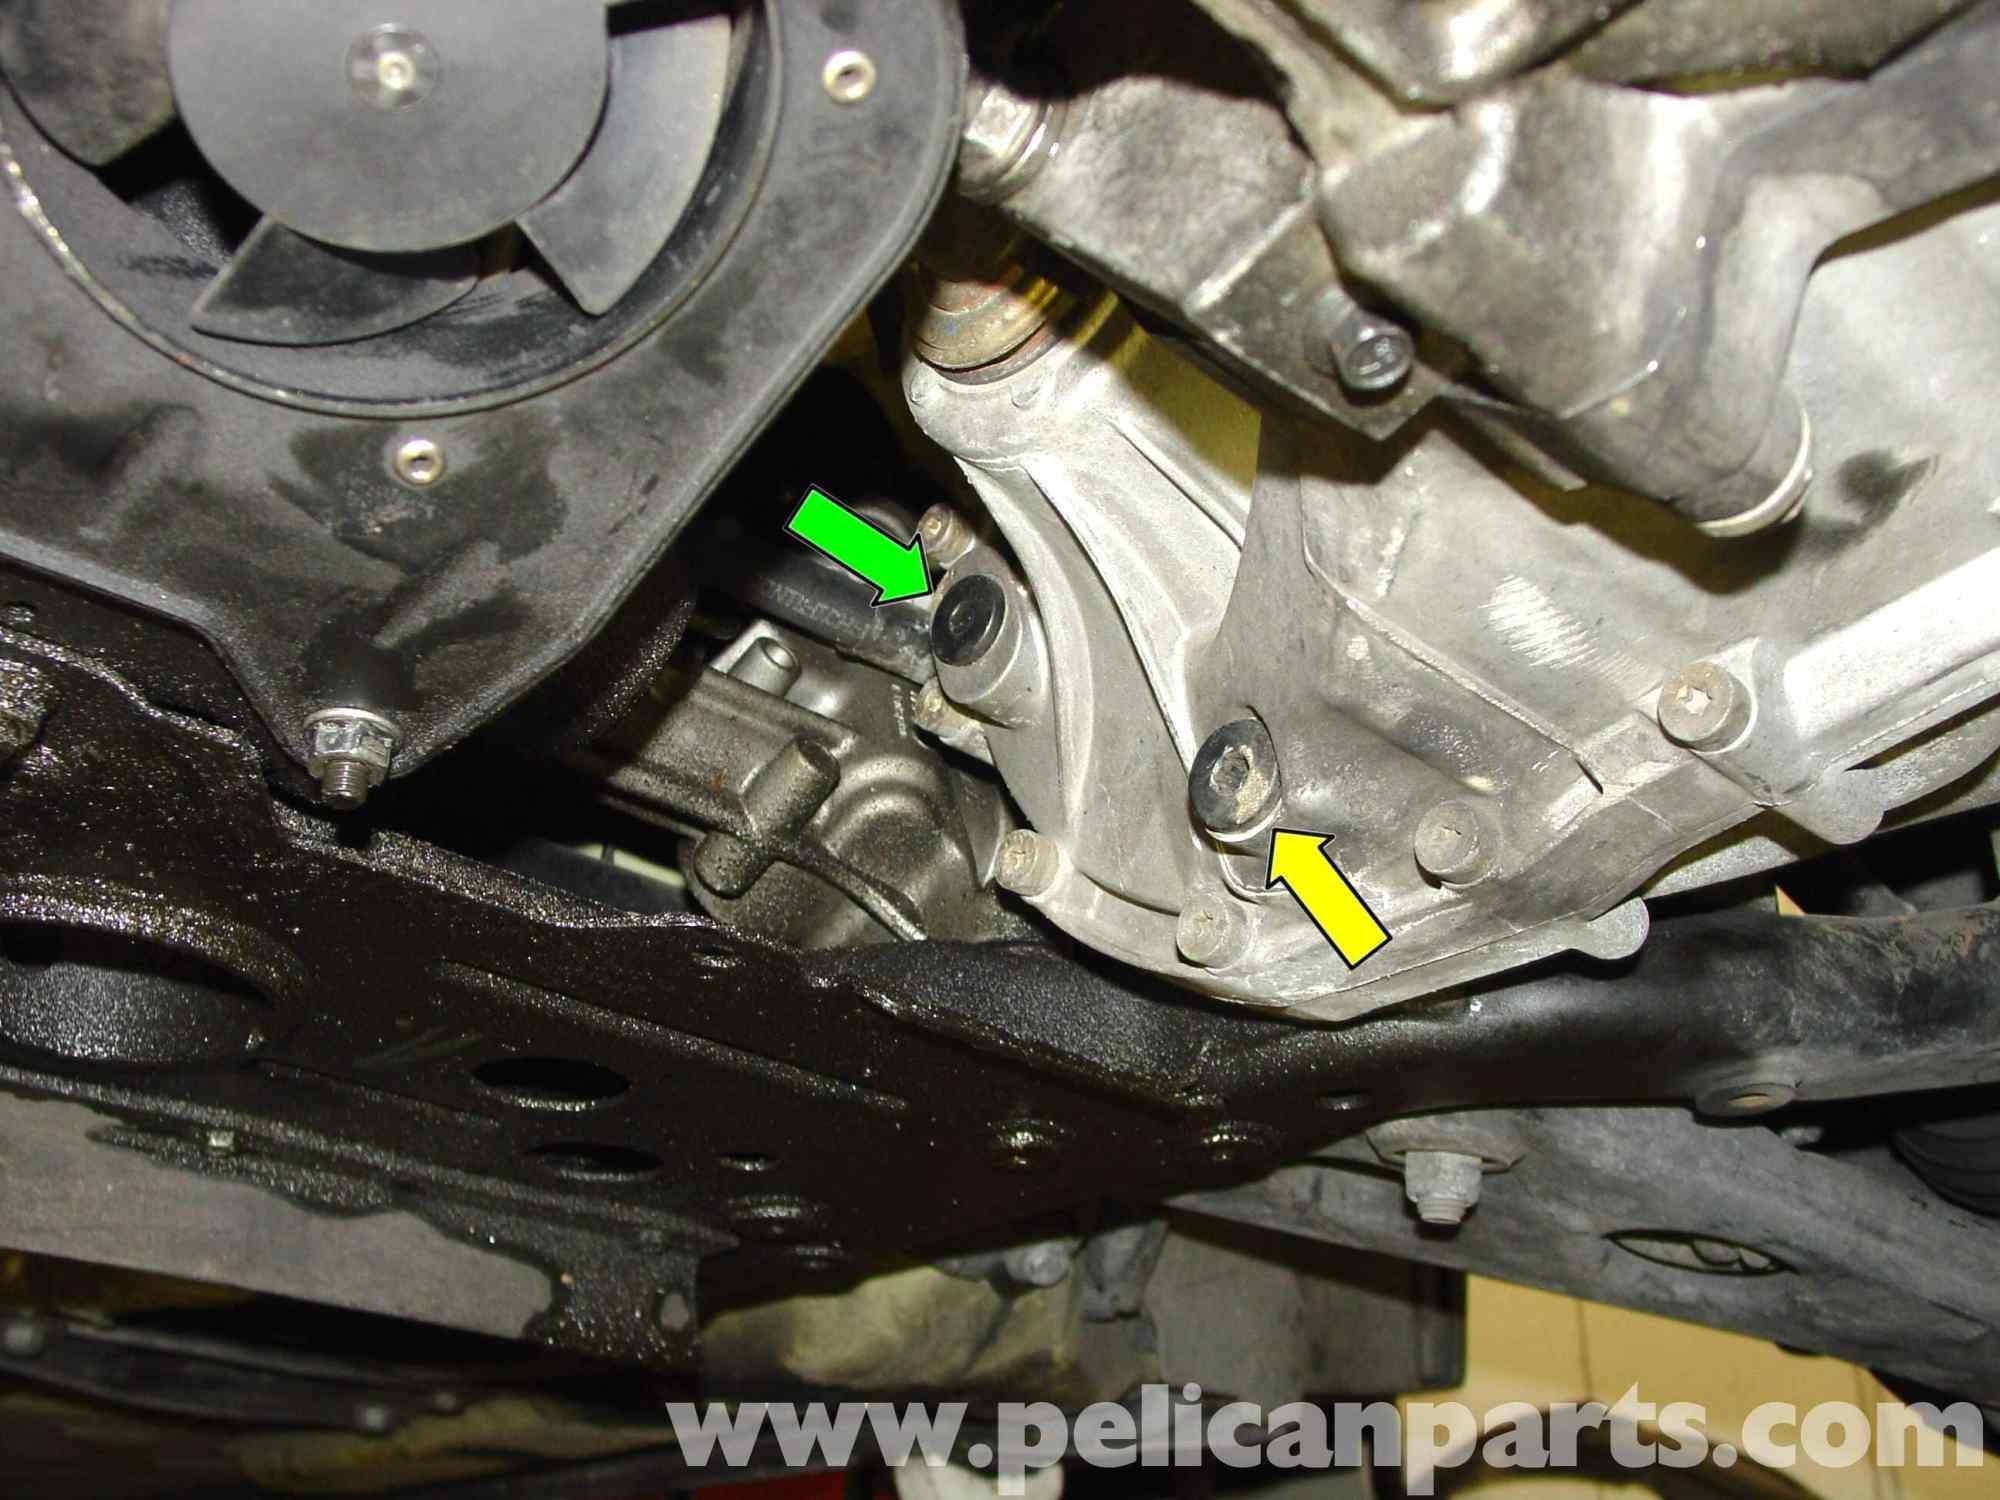 hight resolution of 2009 mini cooper engine parts diagram in addition colorado wiring wire diagram 2009 mini cooper